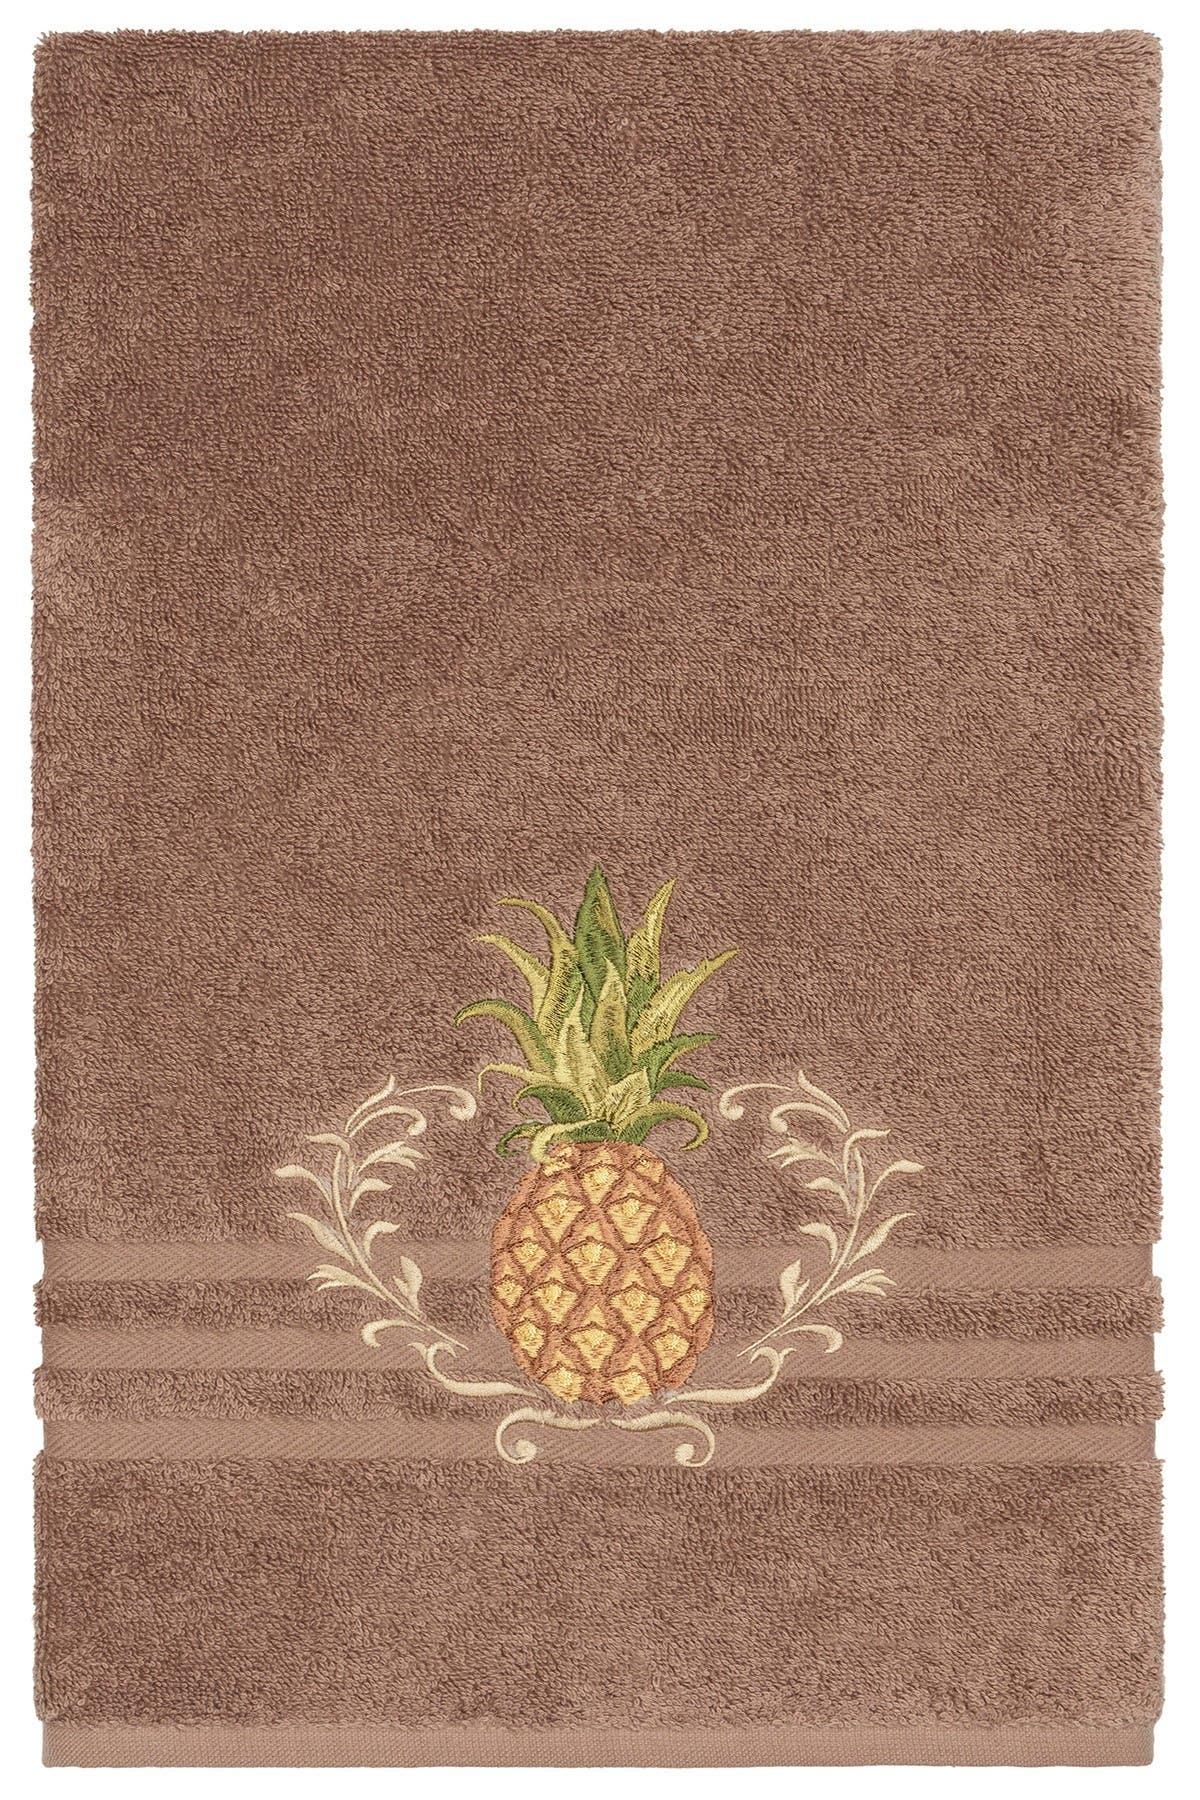 Image of LINUM HOME Welcome 3-Piece Embellished Towel - Latte